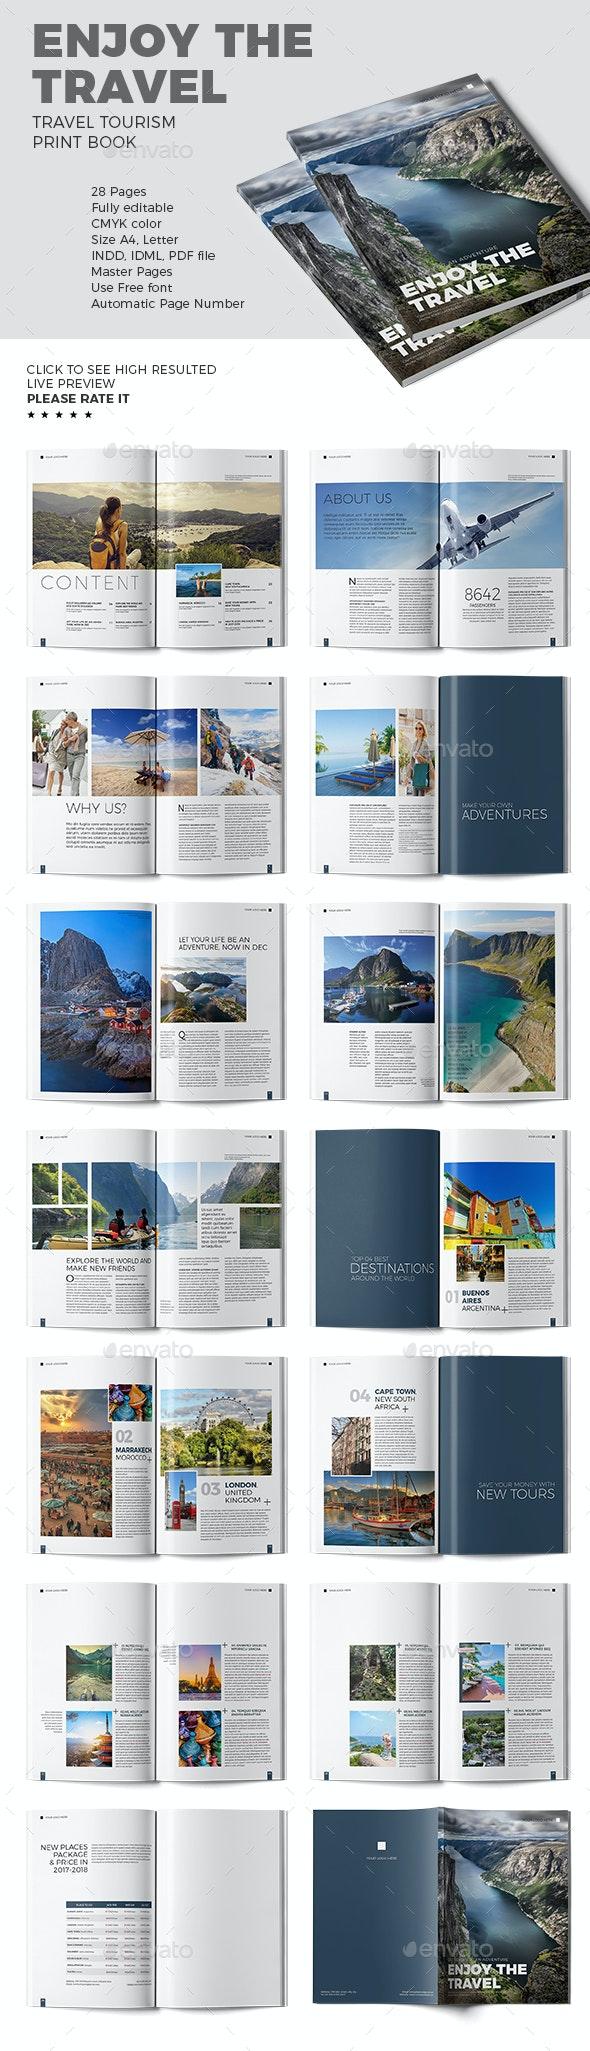 Enjoy The Travel - Travel Book Template - Print Templates